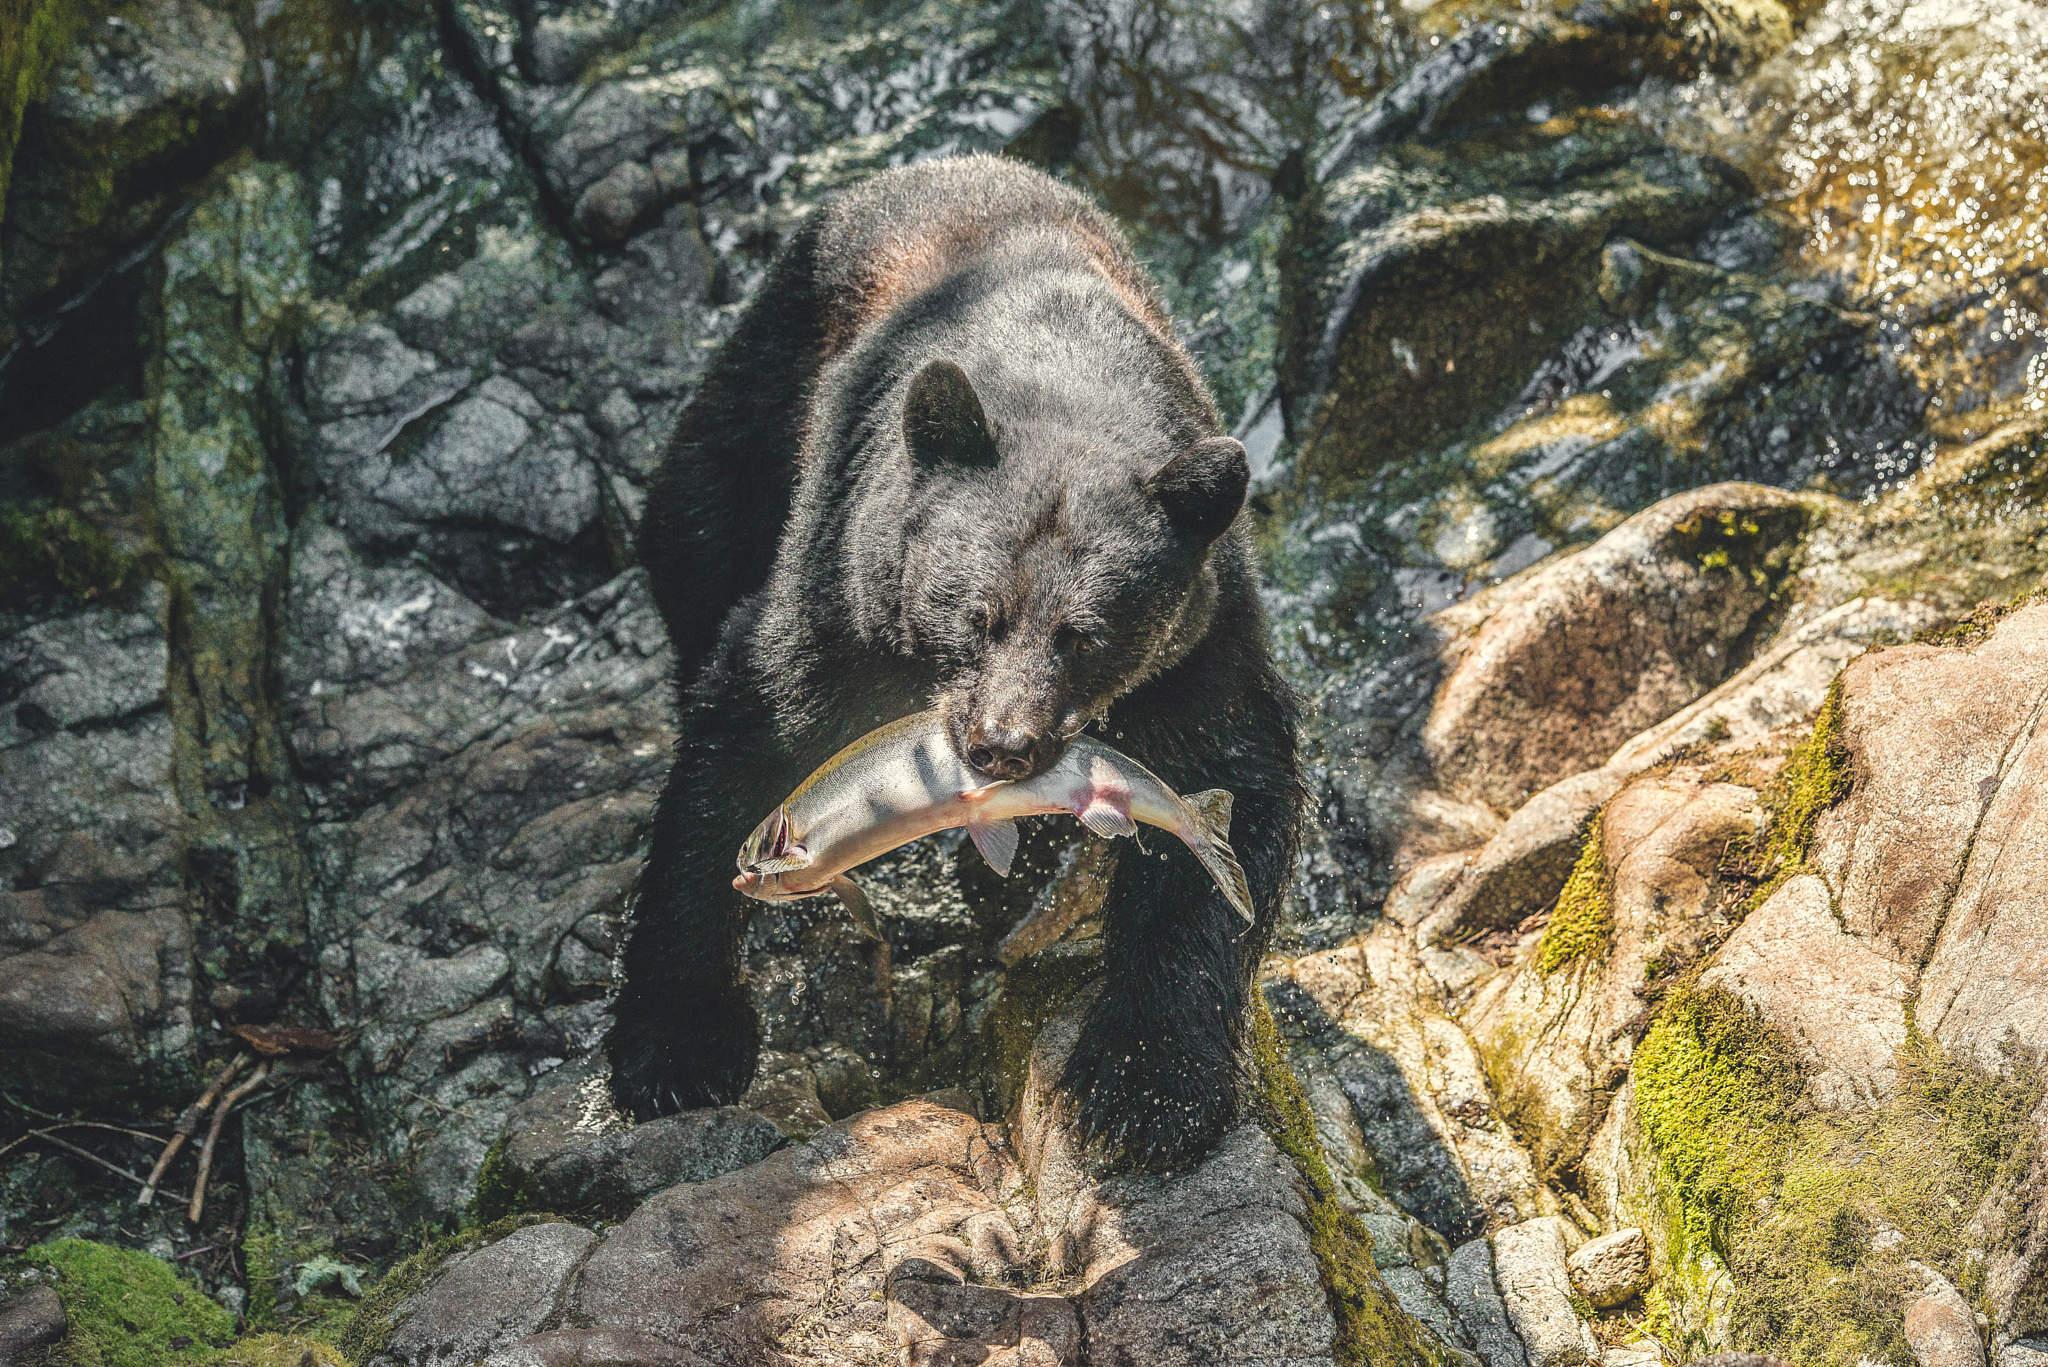 Black bear catching salmon at Anan Creek, Wrangel AK. 2015